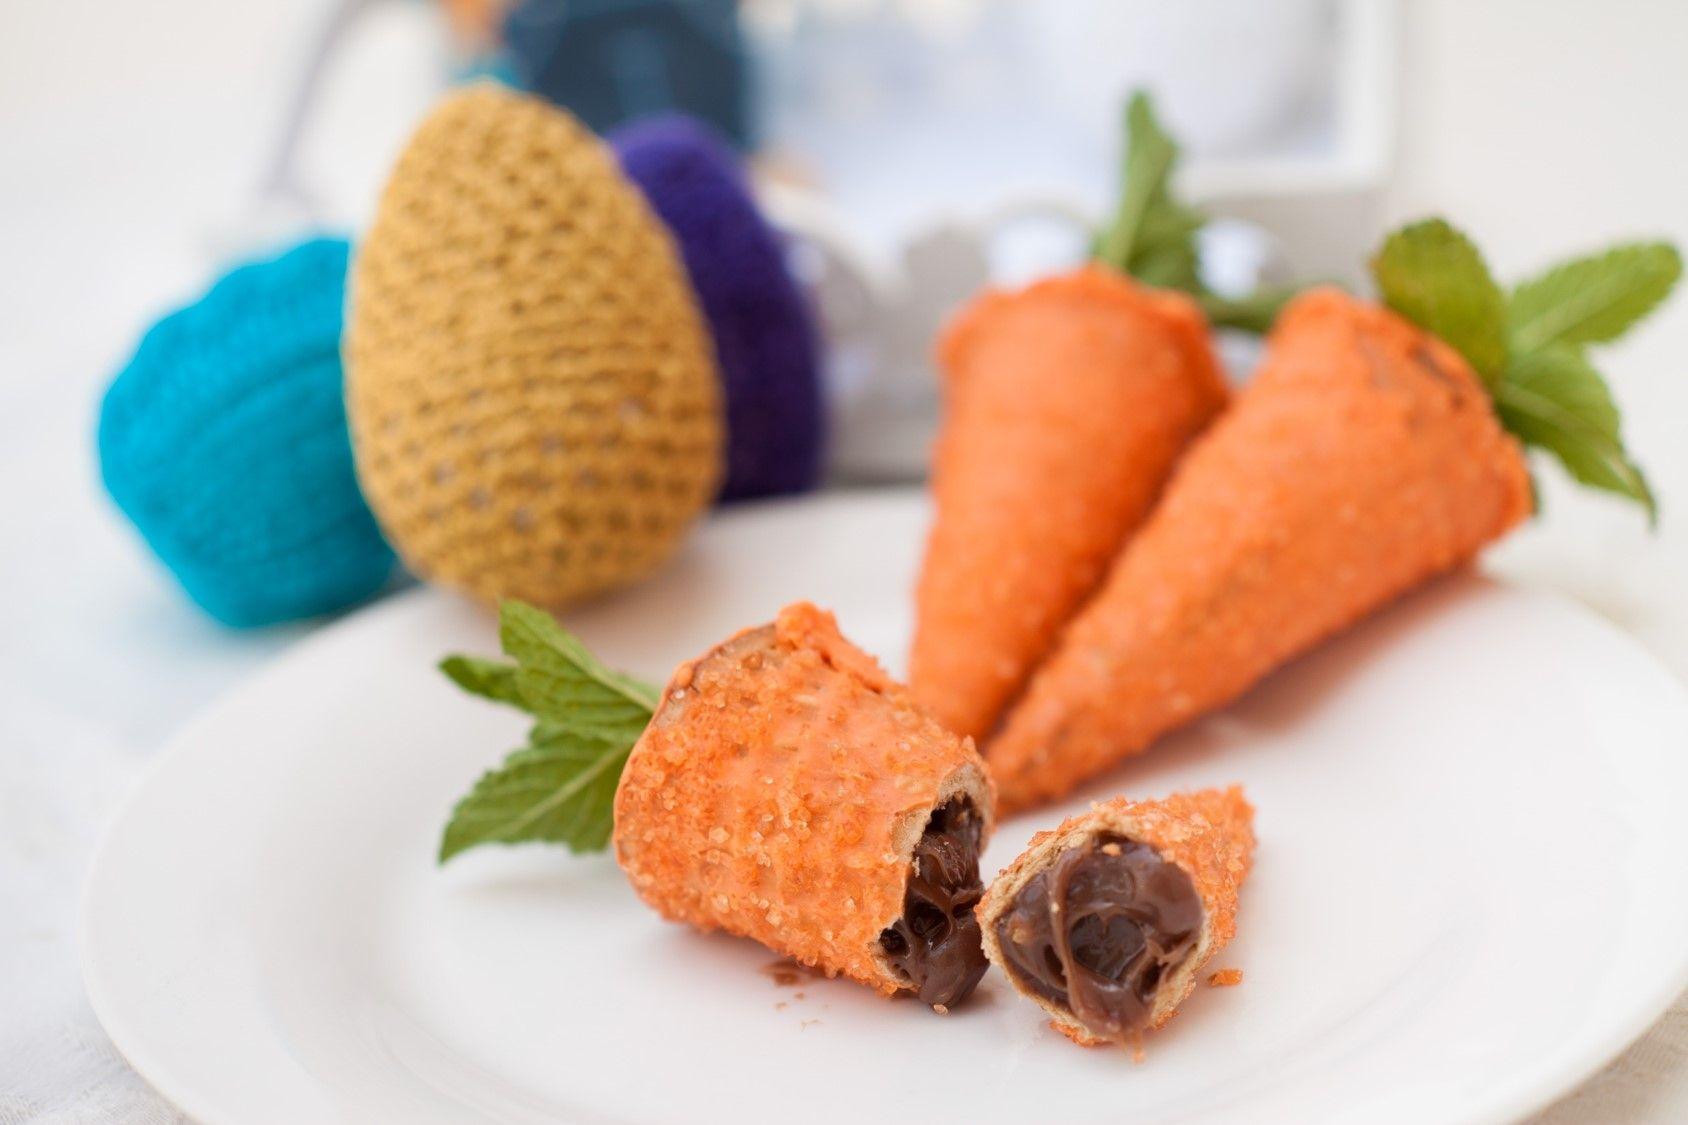 docesparapascoacenourinhasrecheadas - Além do ovo de chocolate: dicas de doces para páscoa para surpreender e encantar